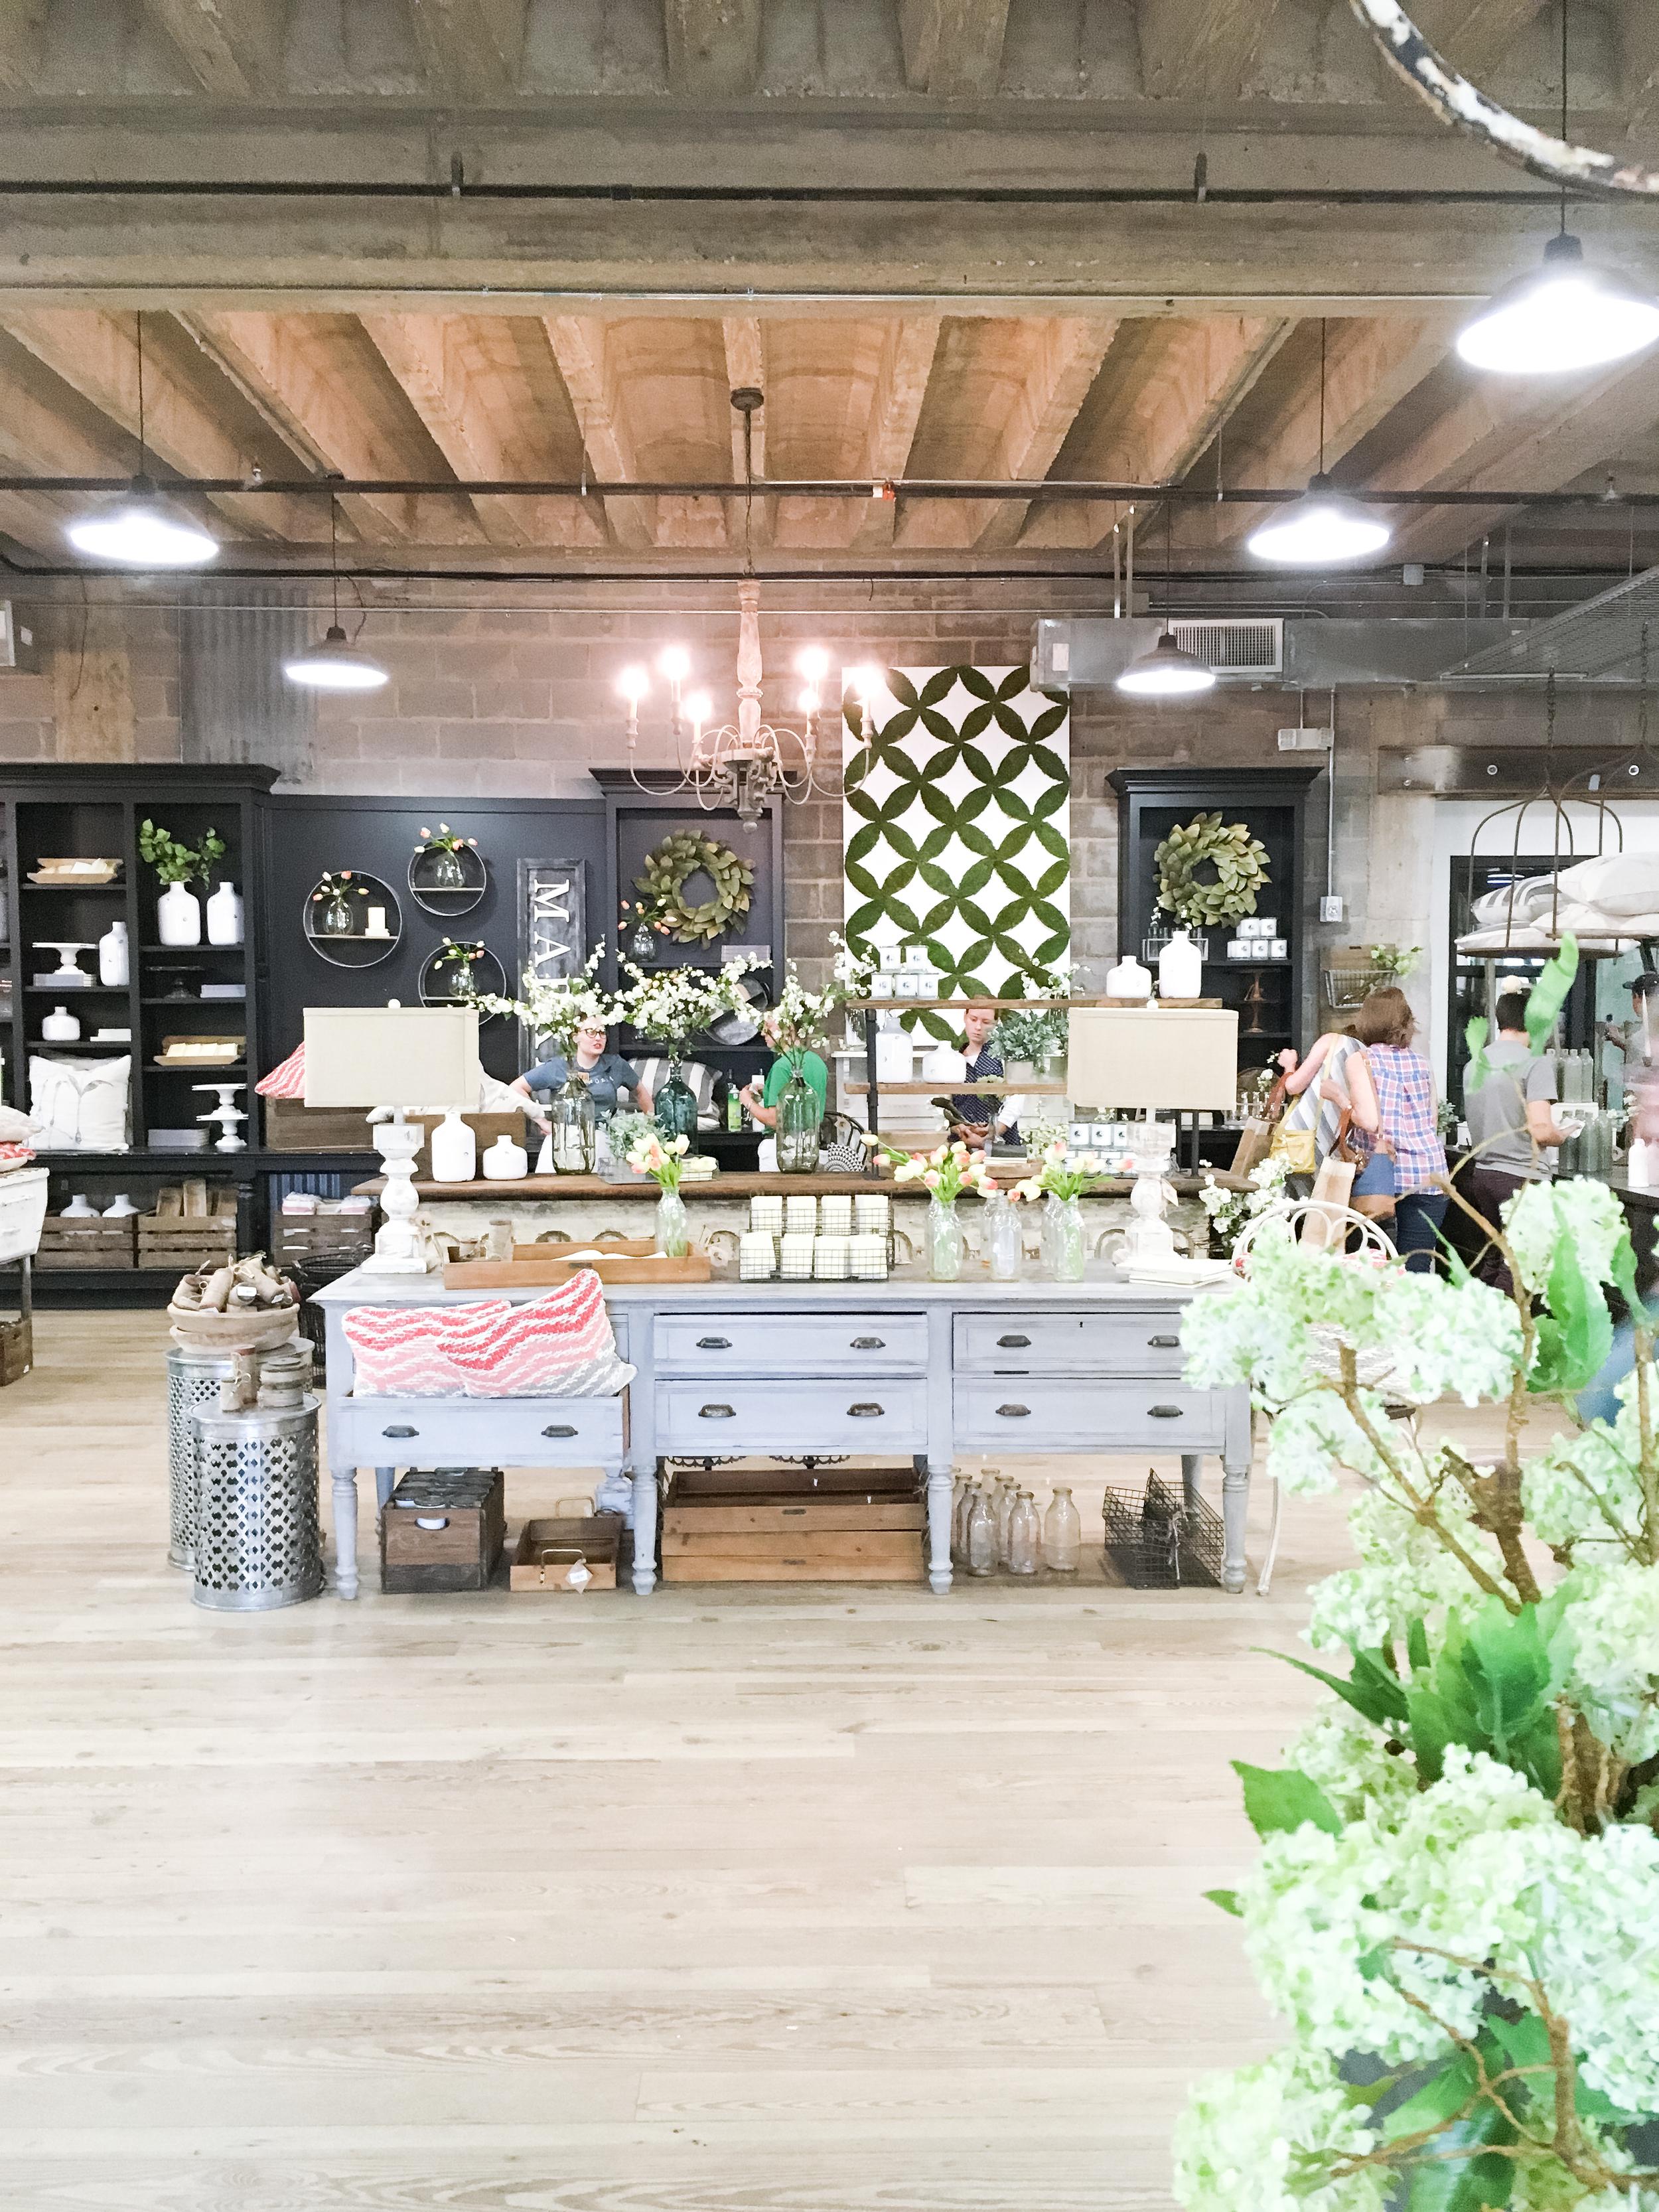 Magnolia Market Store Inside - Fixer Upper on HGTV - Brightly & Co